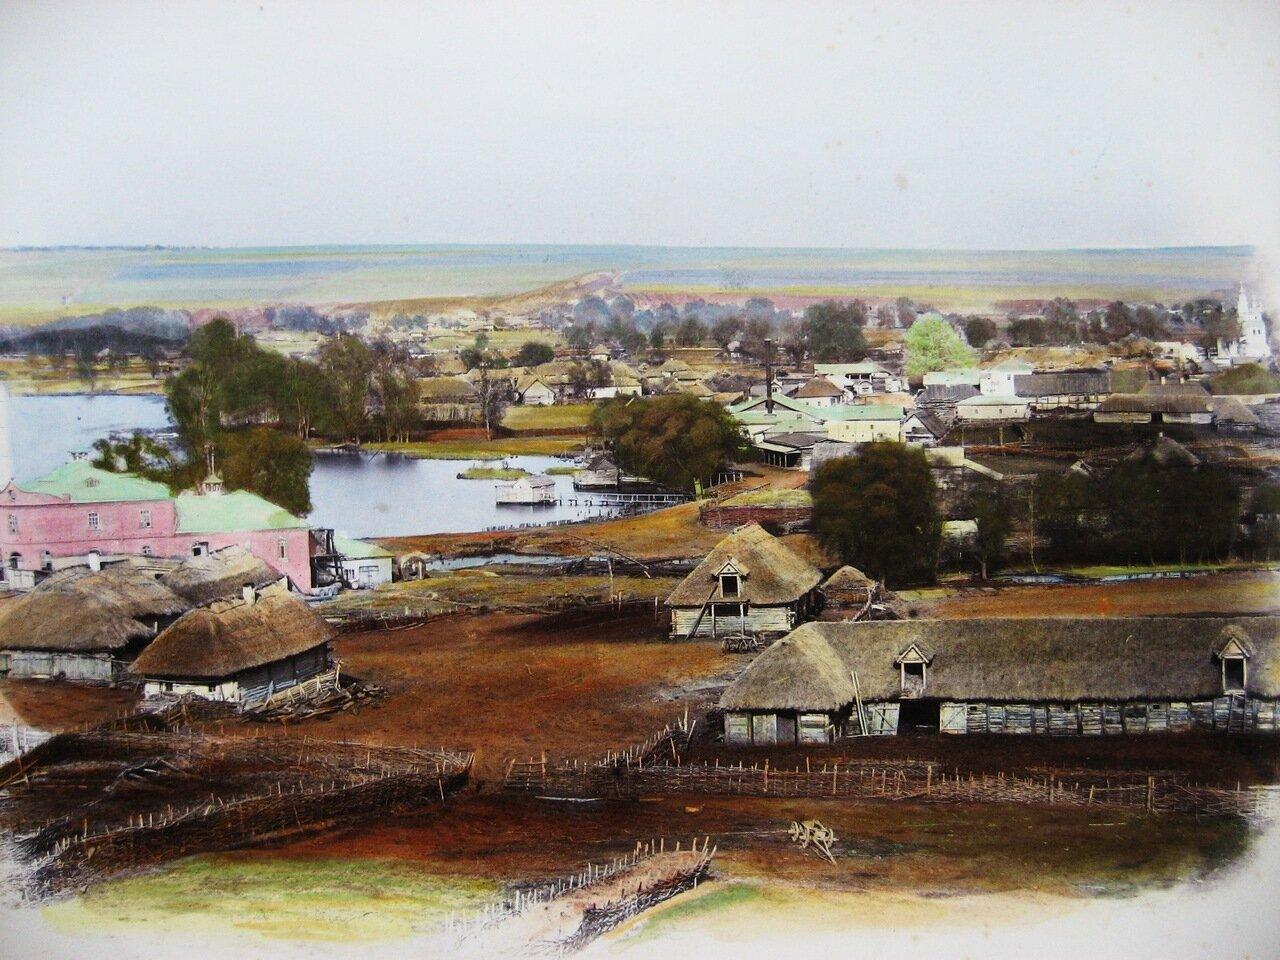 8. Село Артемовка